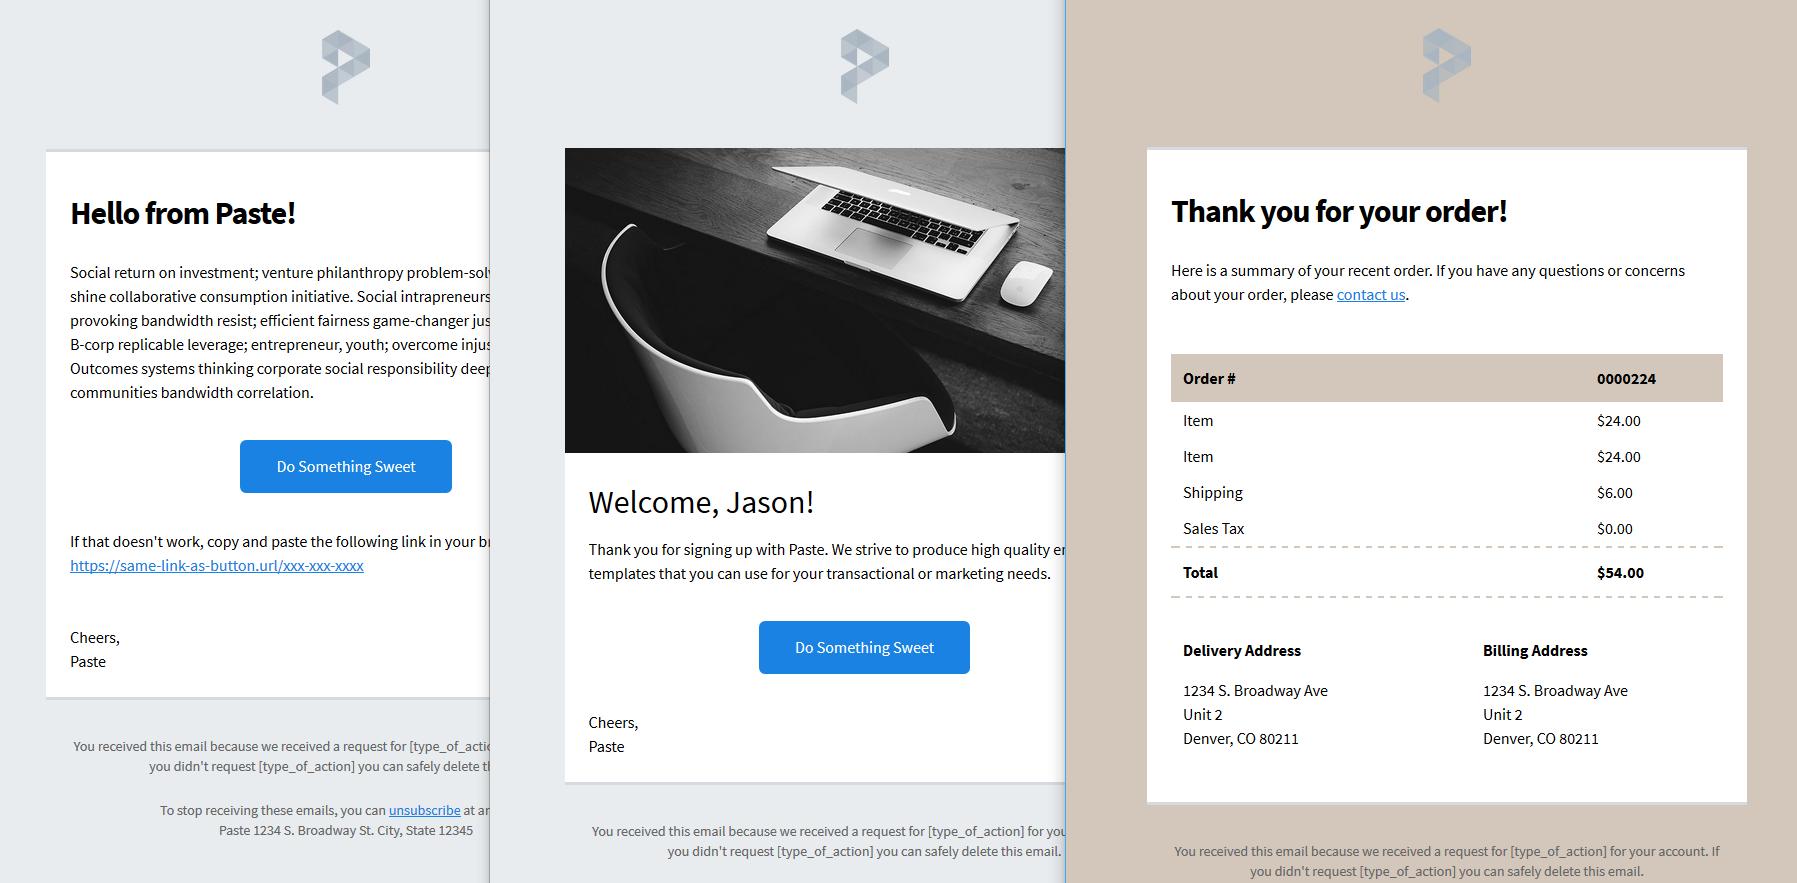 SendGridのオープンソースメールテンプレート「Paste」について